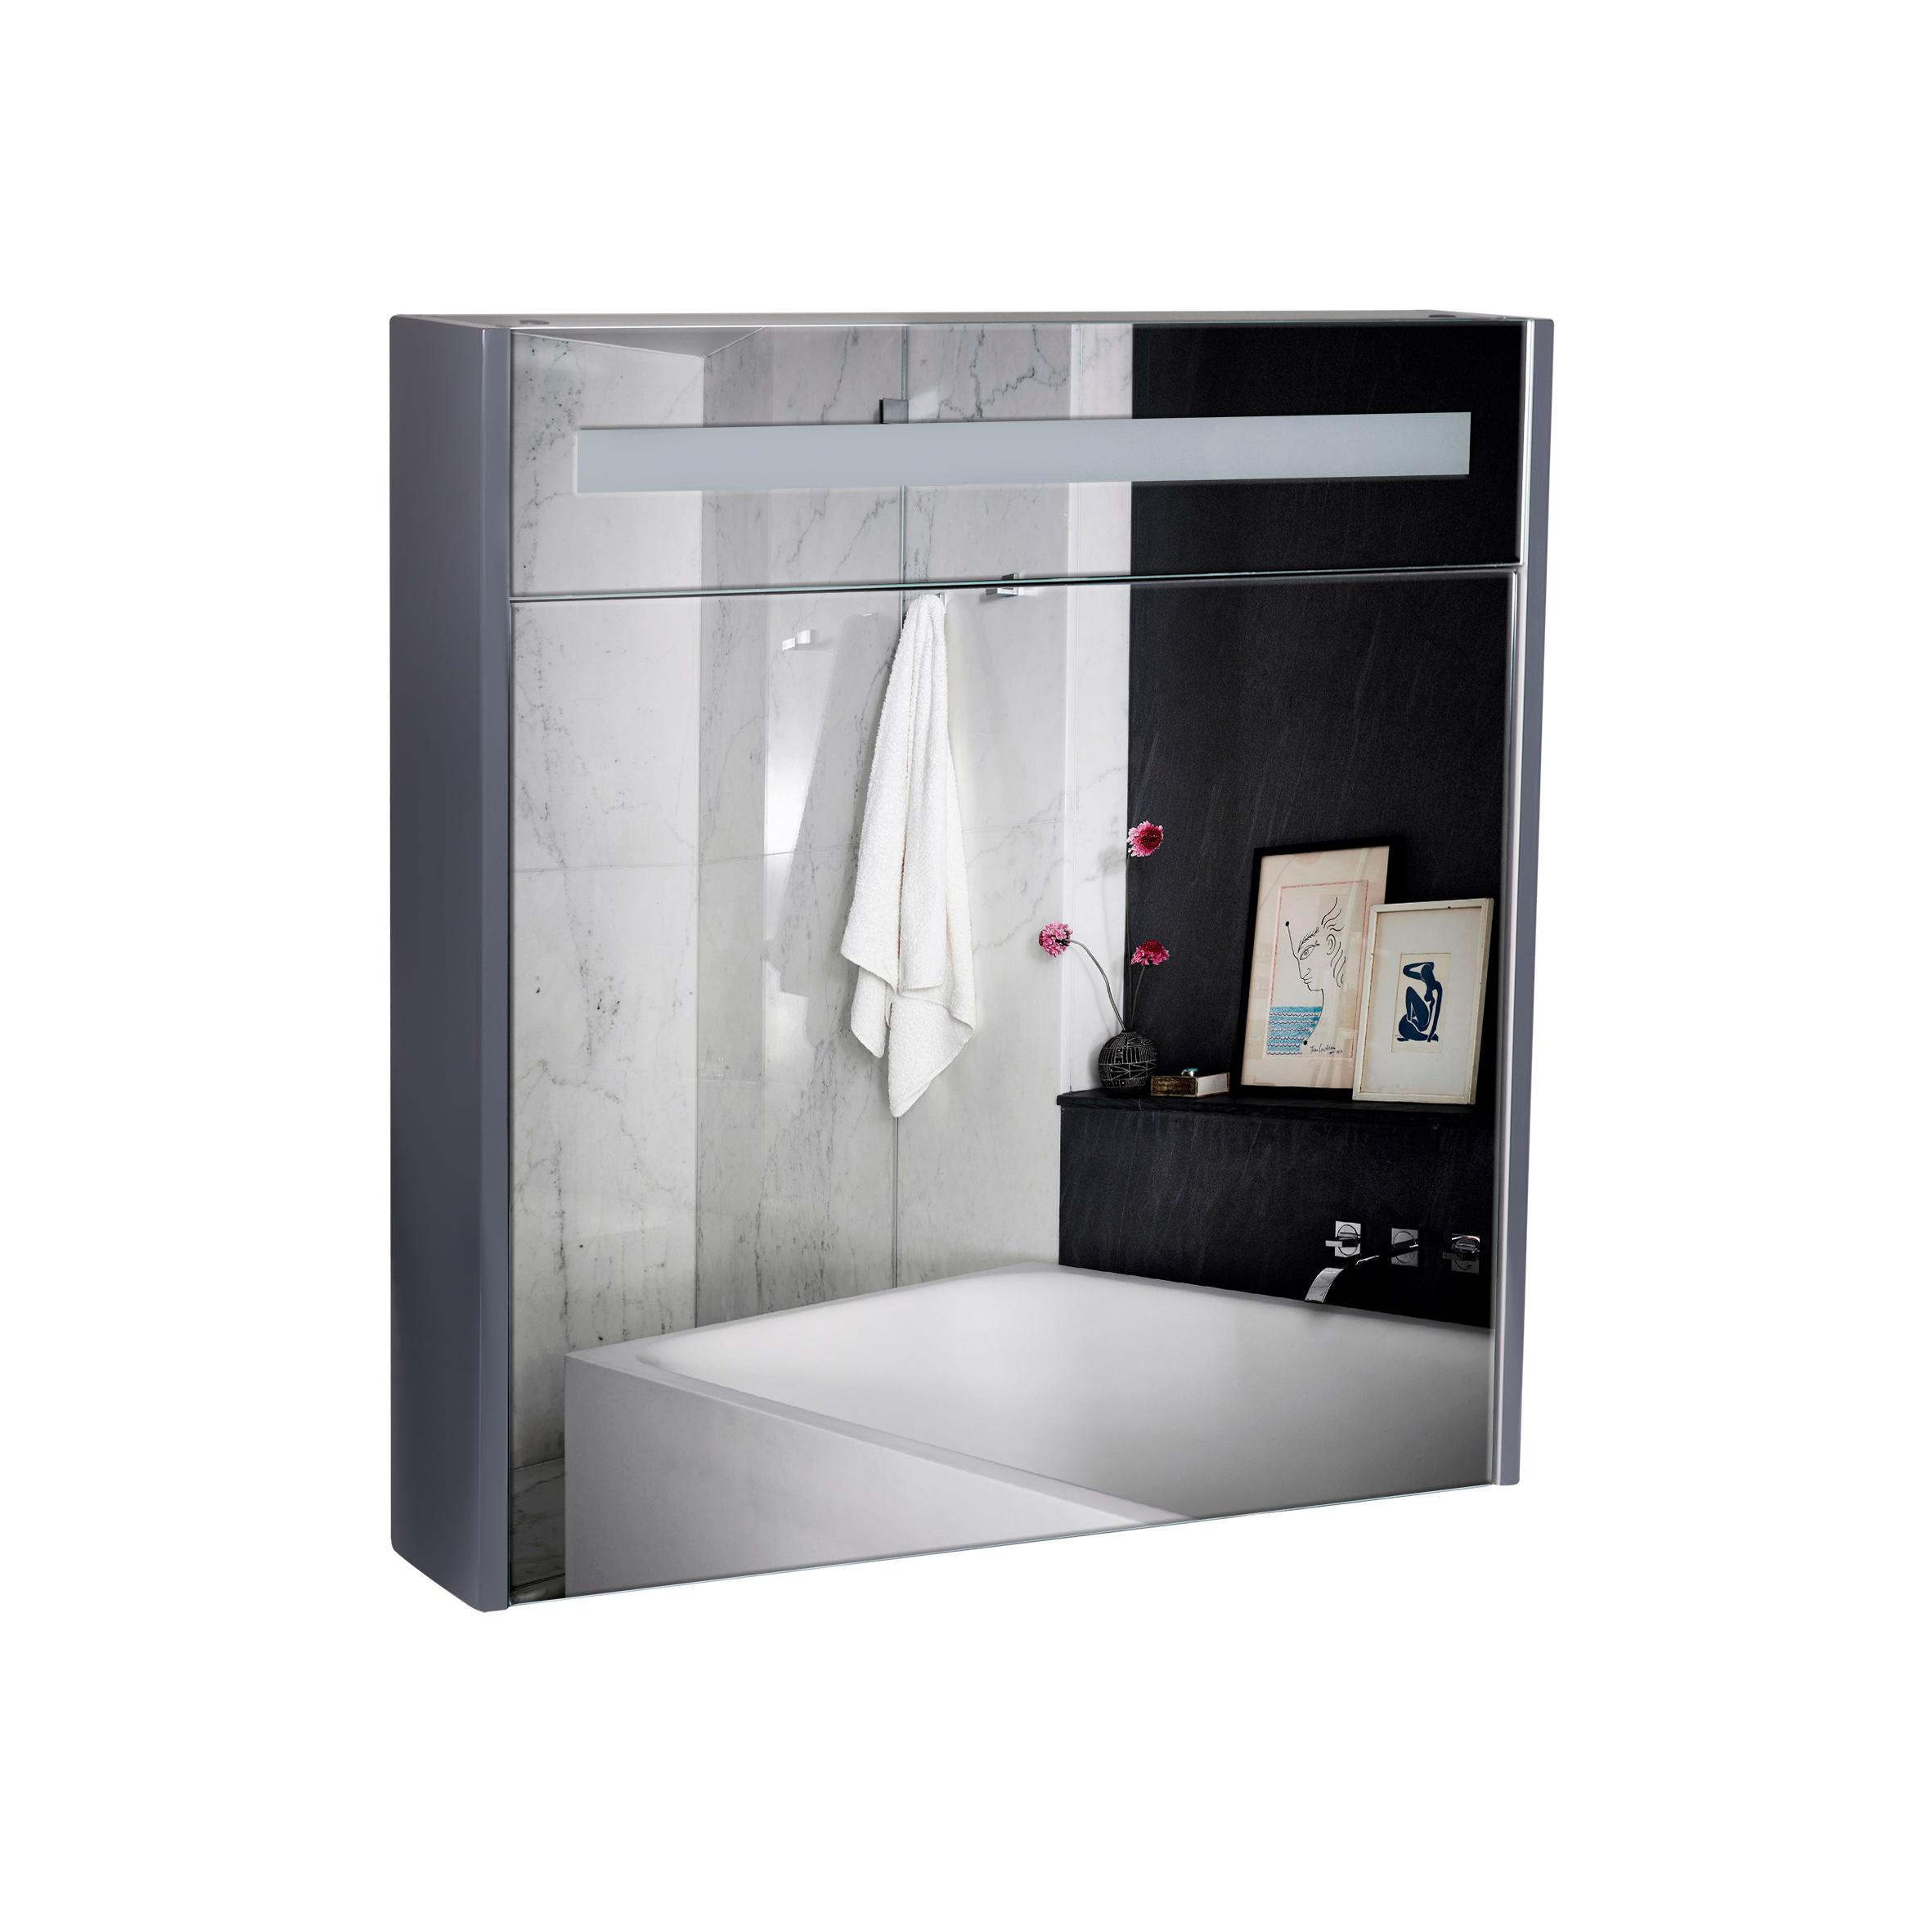 Зеркальный шкаф подвесной Qtap Robin 700х730х145 Graphite с LED-подсветкой QT1377ZP7002G